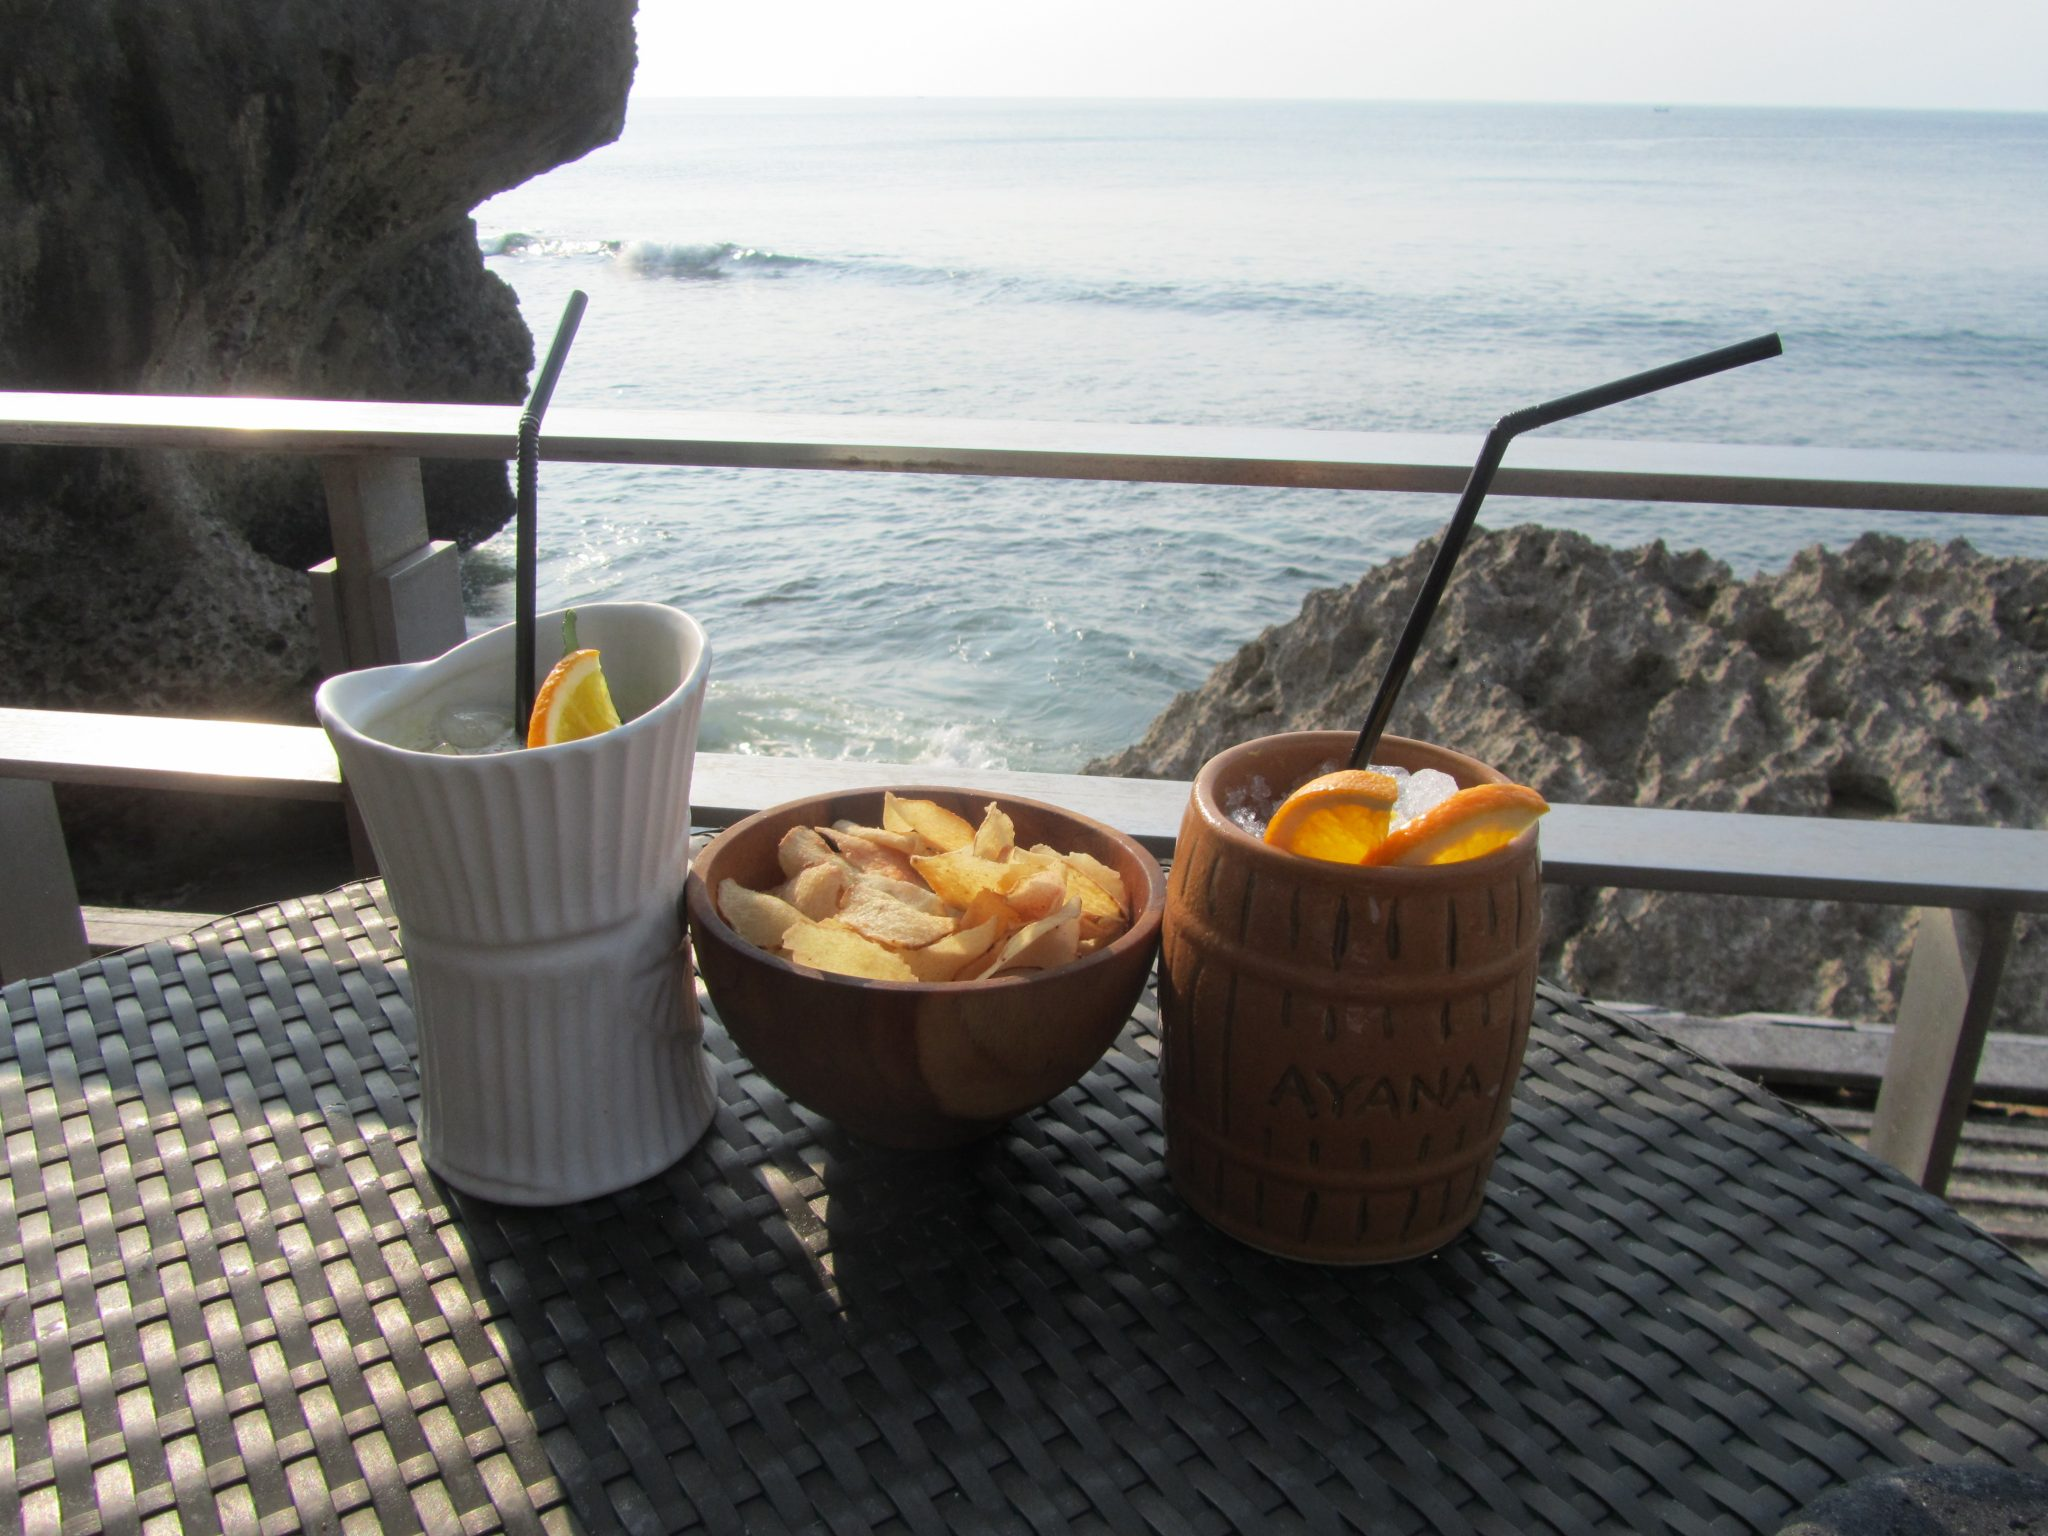 Cocktails at The Rock Bar, Bali